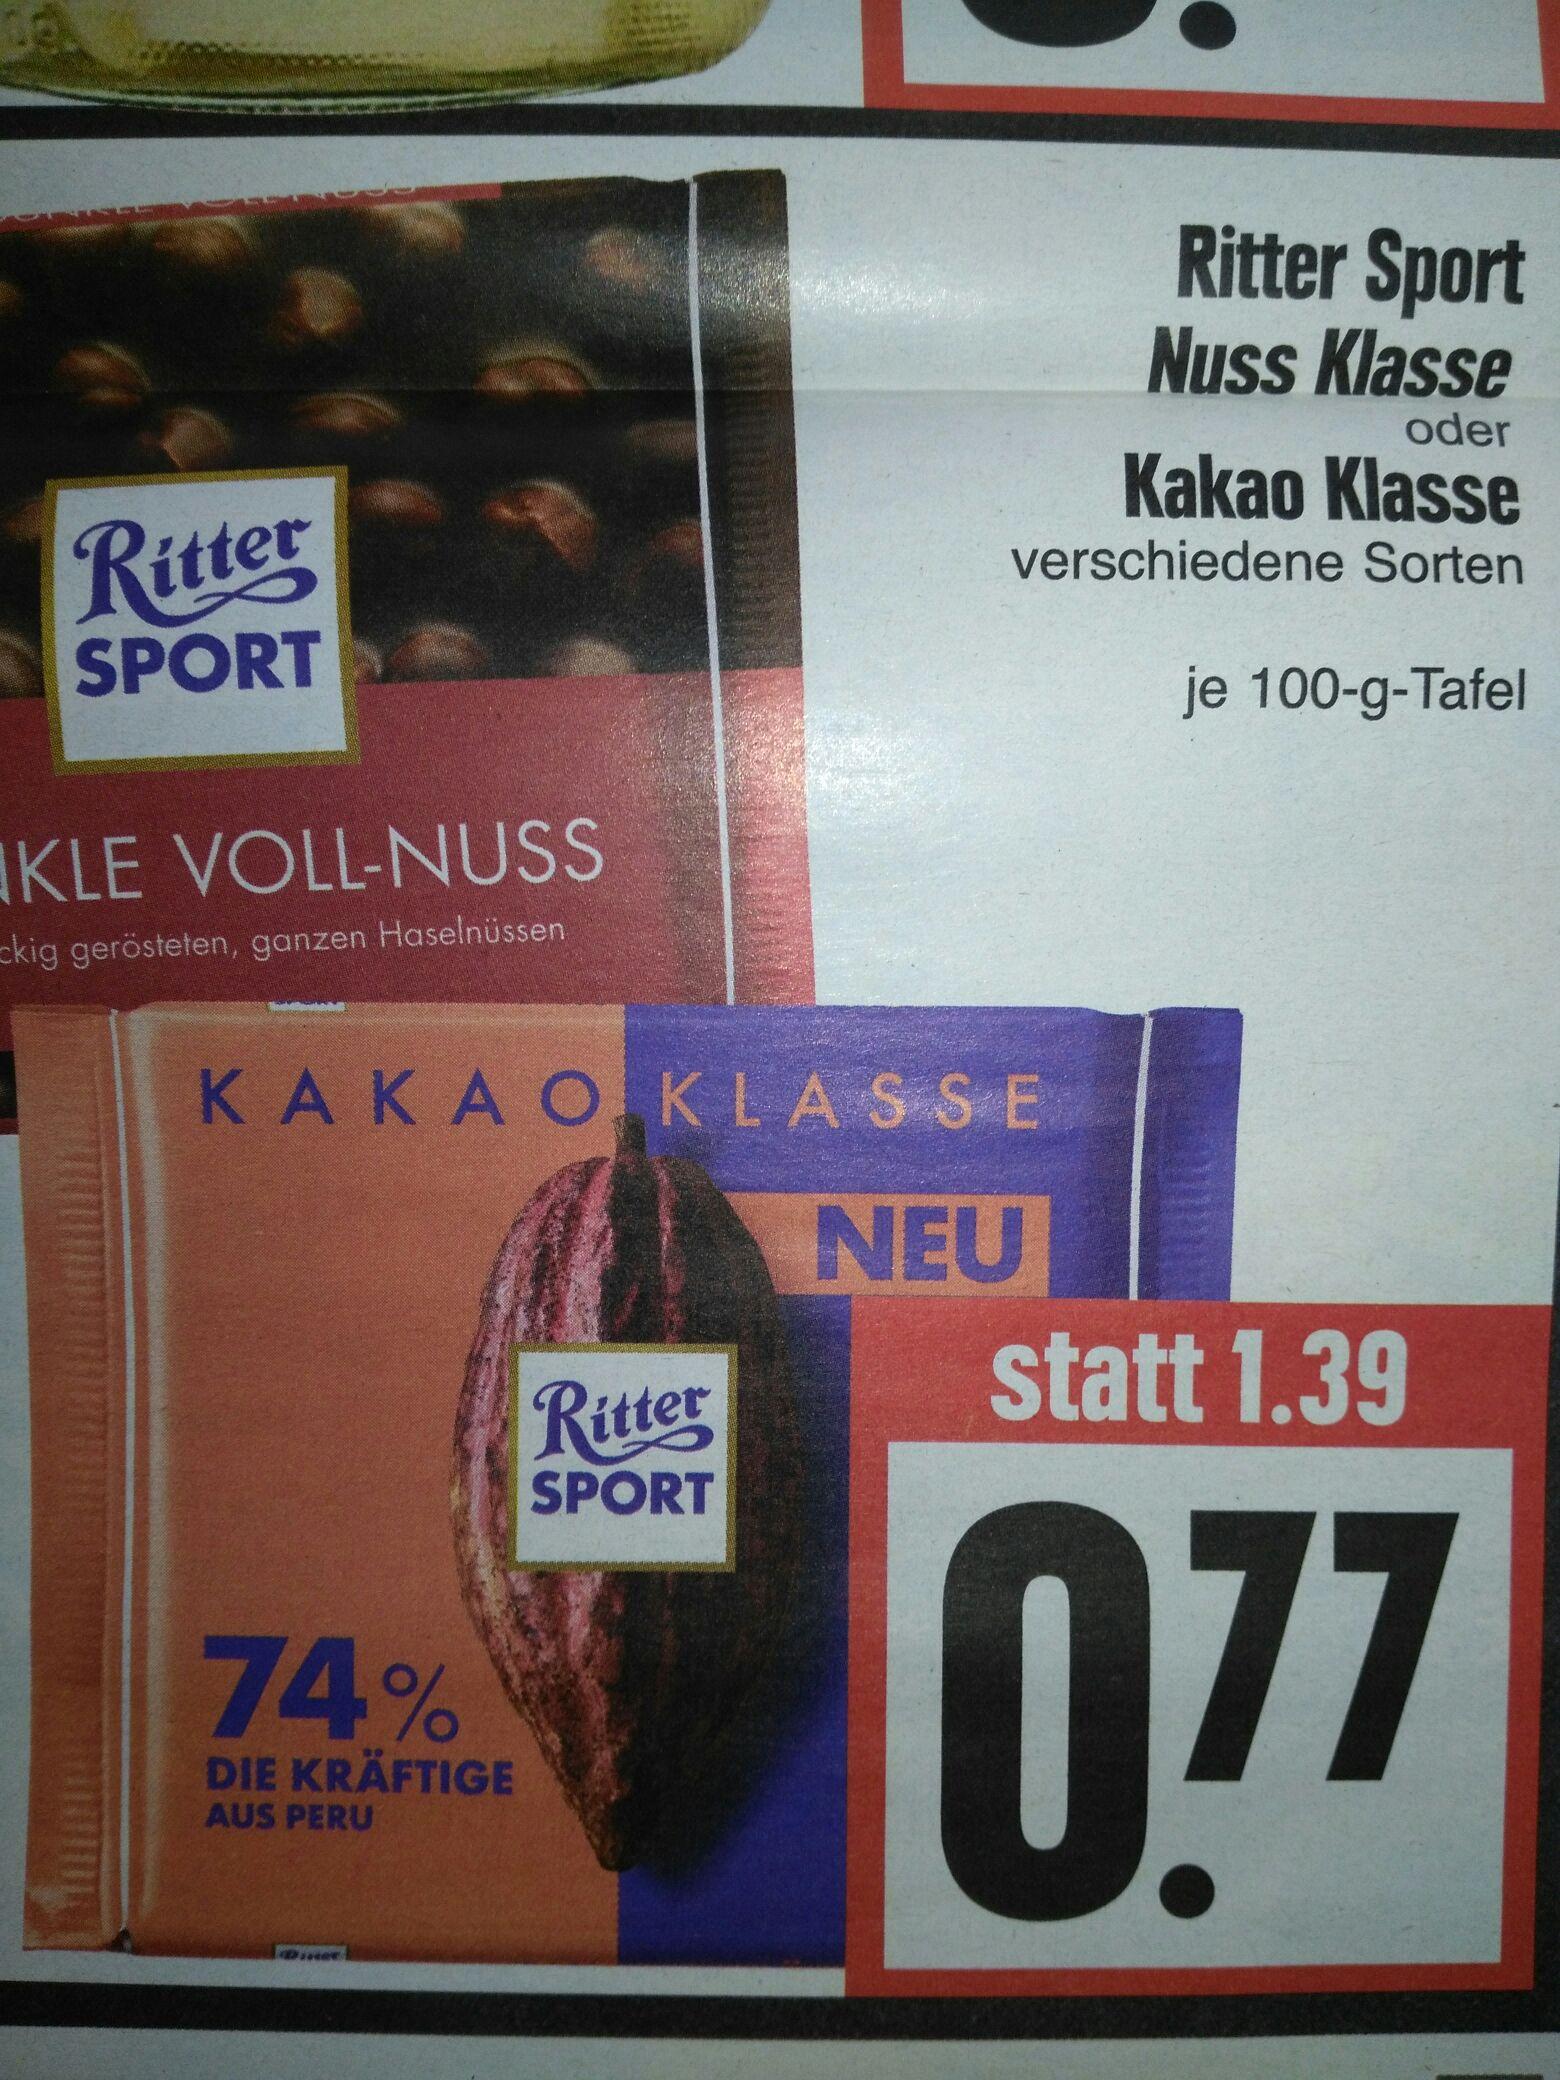 Ritter Sport Nuss oder Kakao Klasse bei Edeka